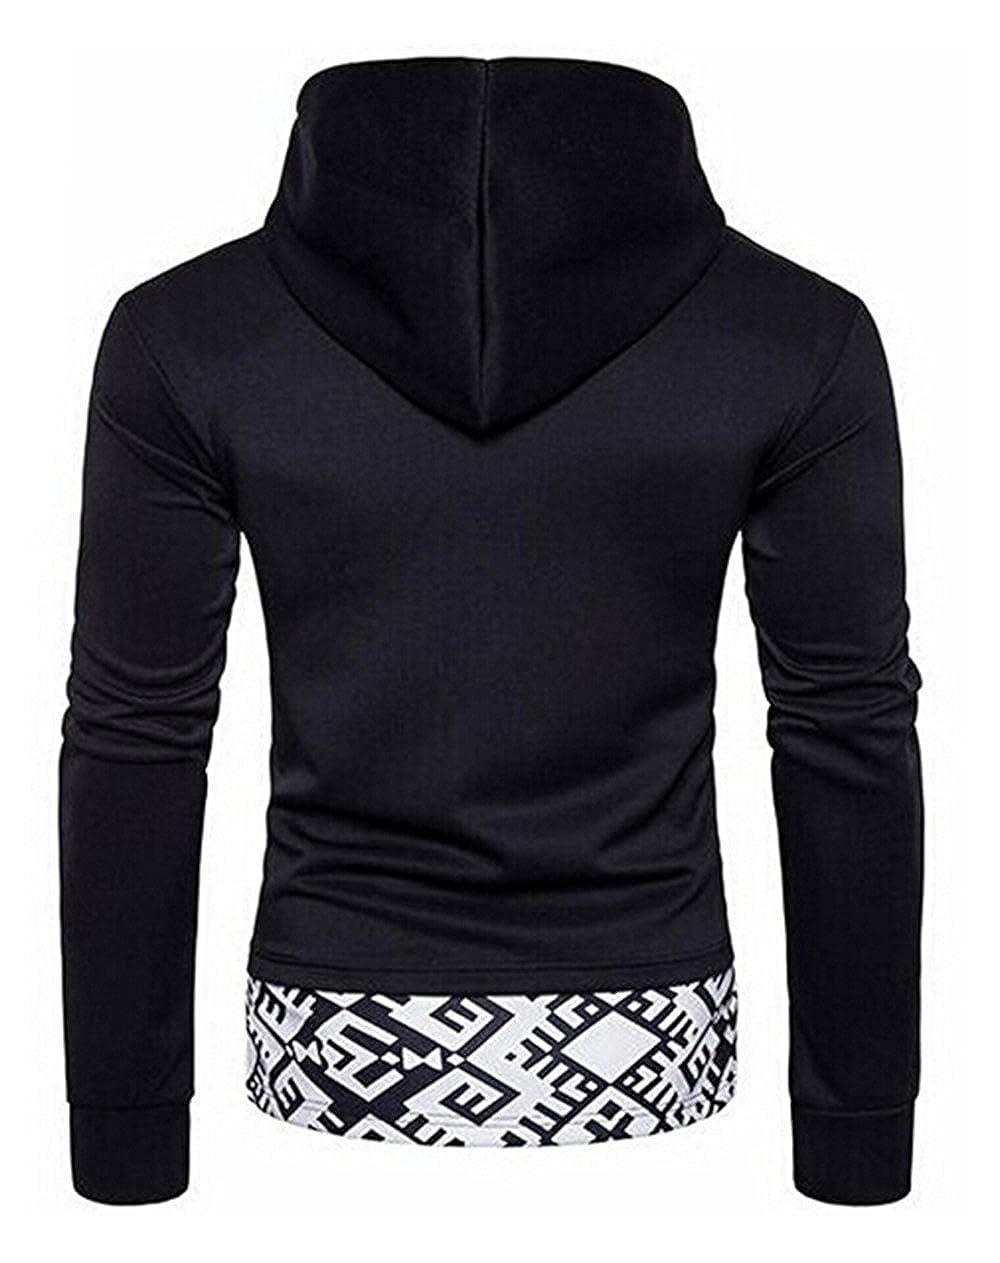 goldenharvest GH Mens Long Sleeve Pullover Tops Hoode Sweatshirt